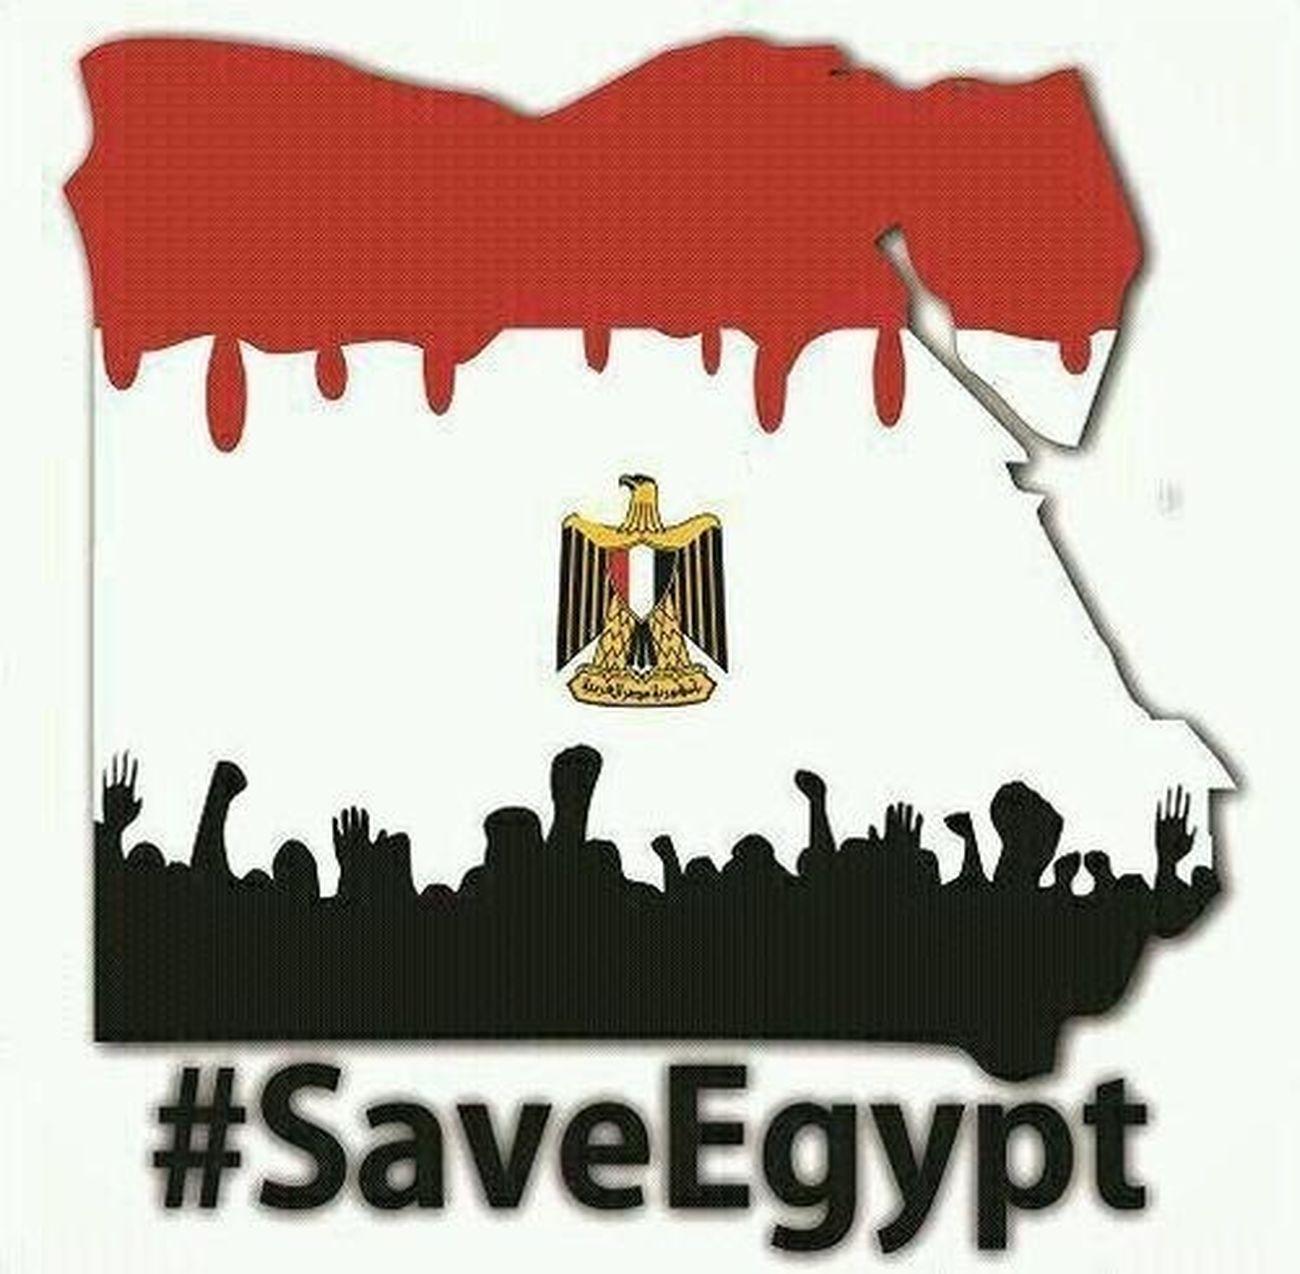 SaveEgypt